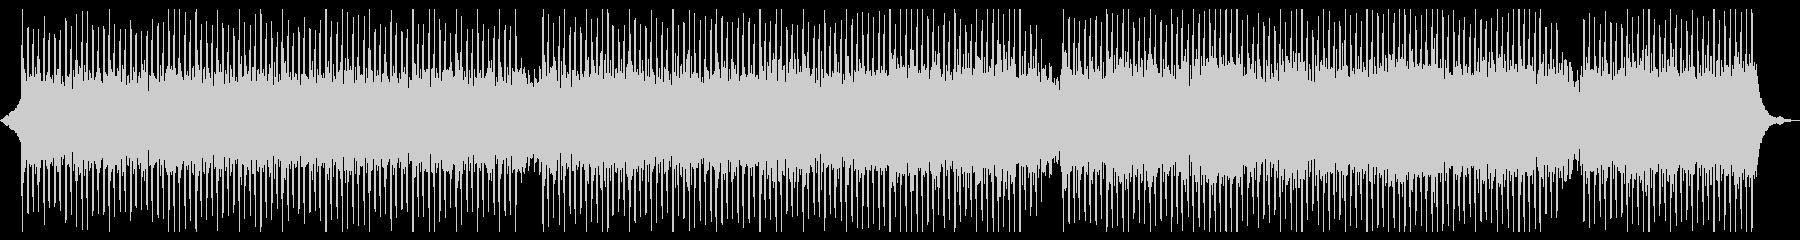 Successfulの未再生の波形